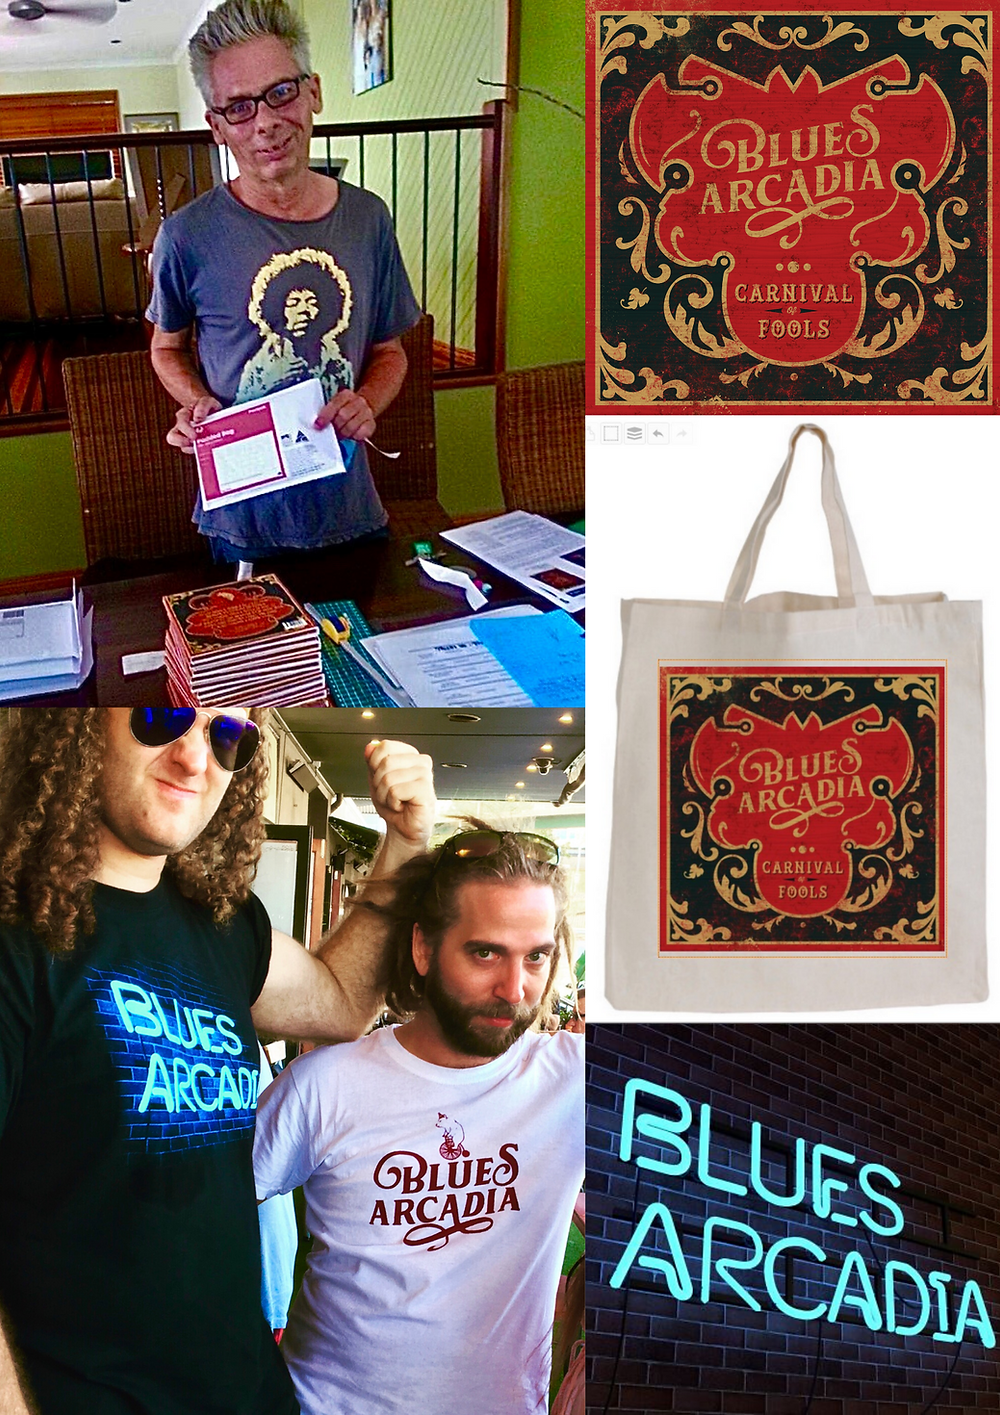 Blues Arcadia T-shirts and Apparel